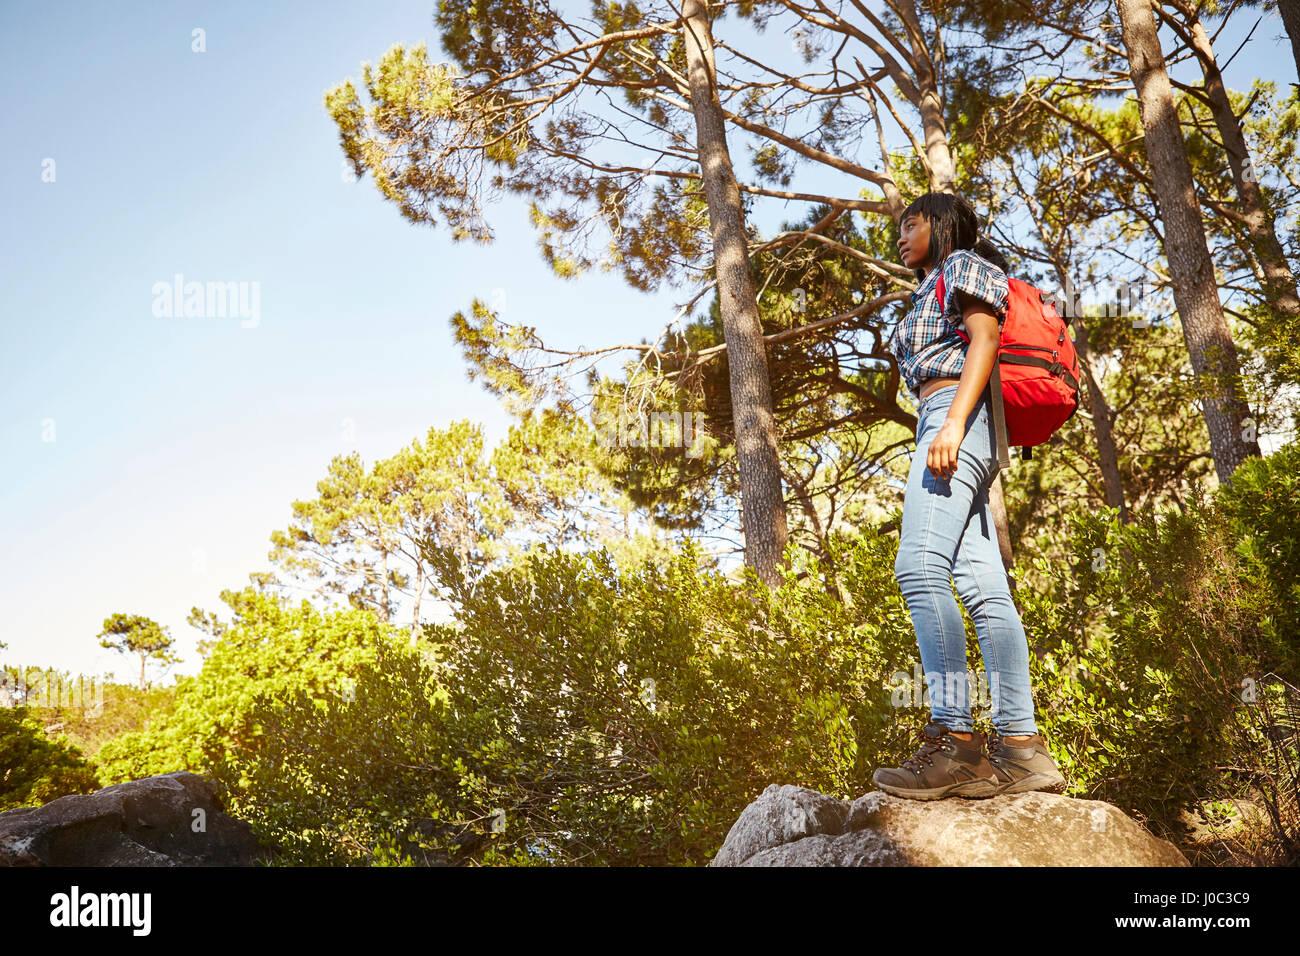 Junge Frau auf Felsen steht, betrachten, Cape Town, Südafrika Stockbild